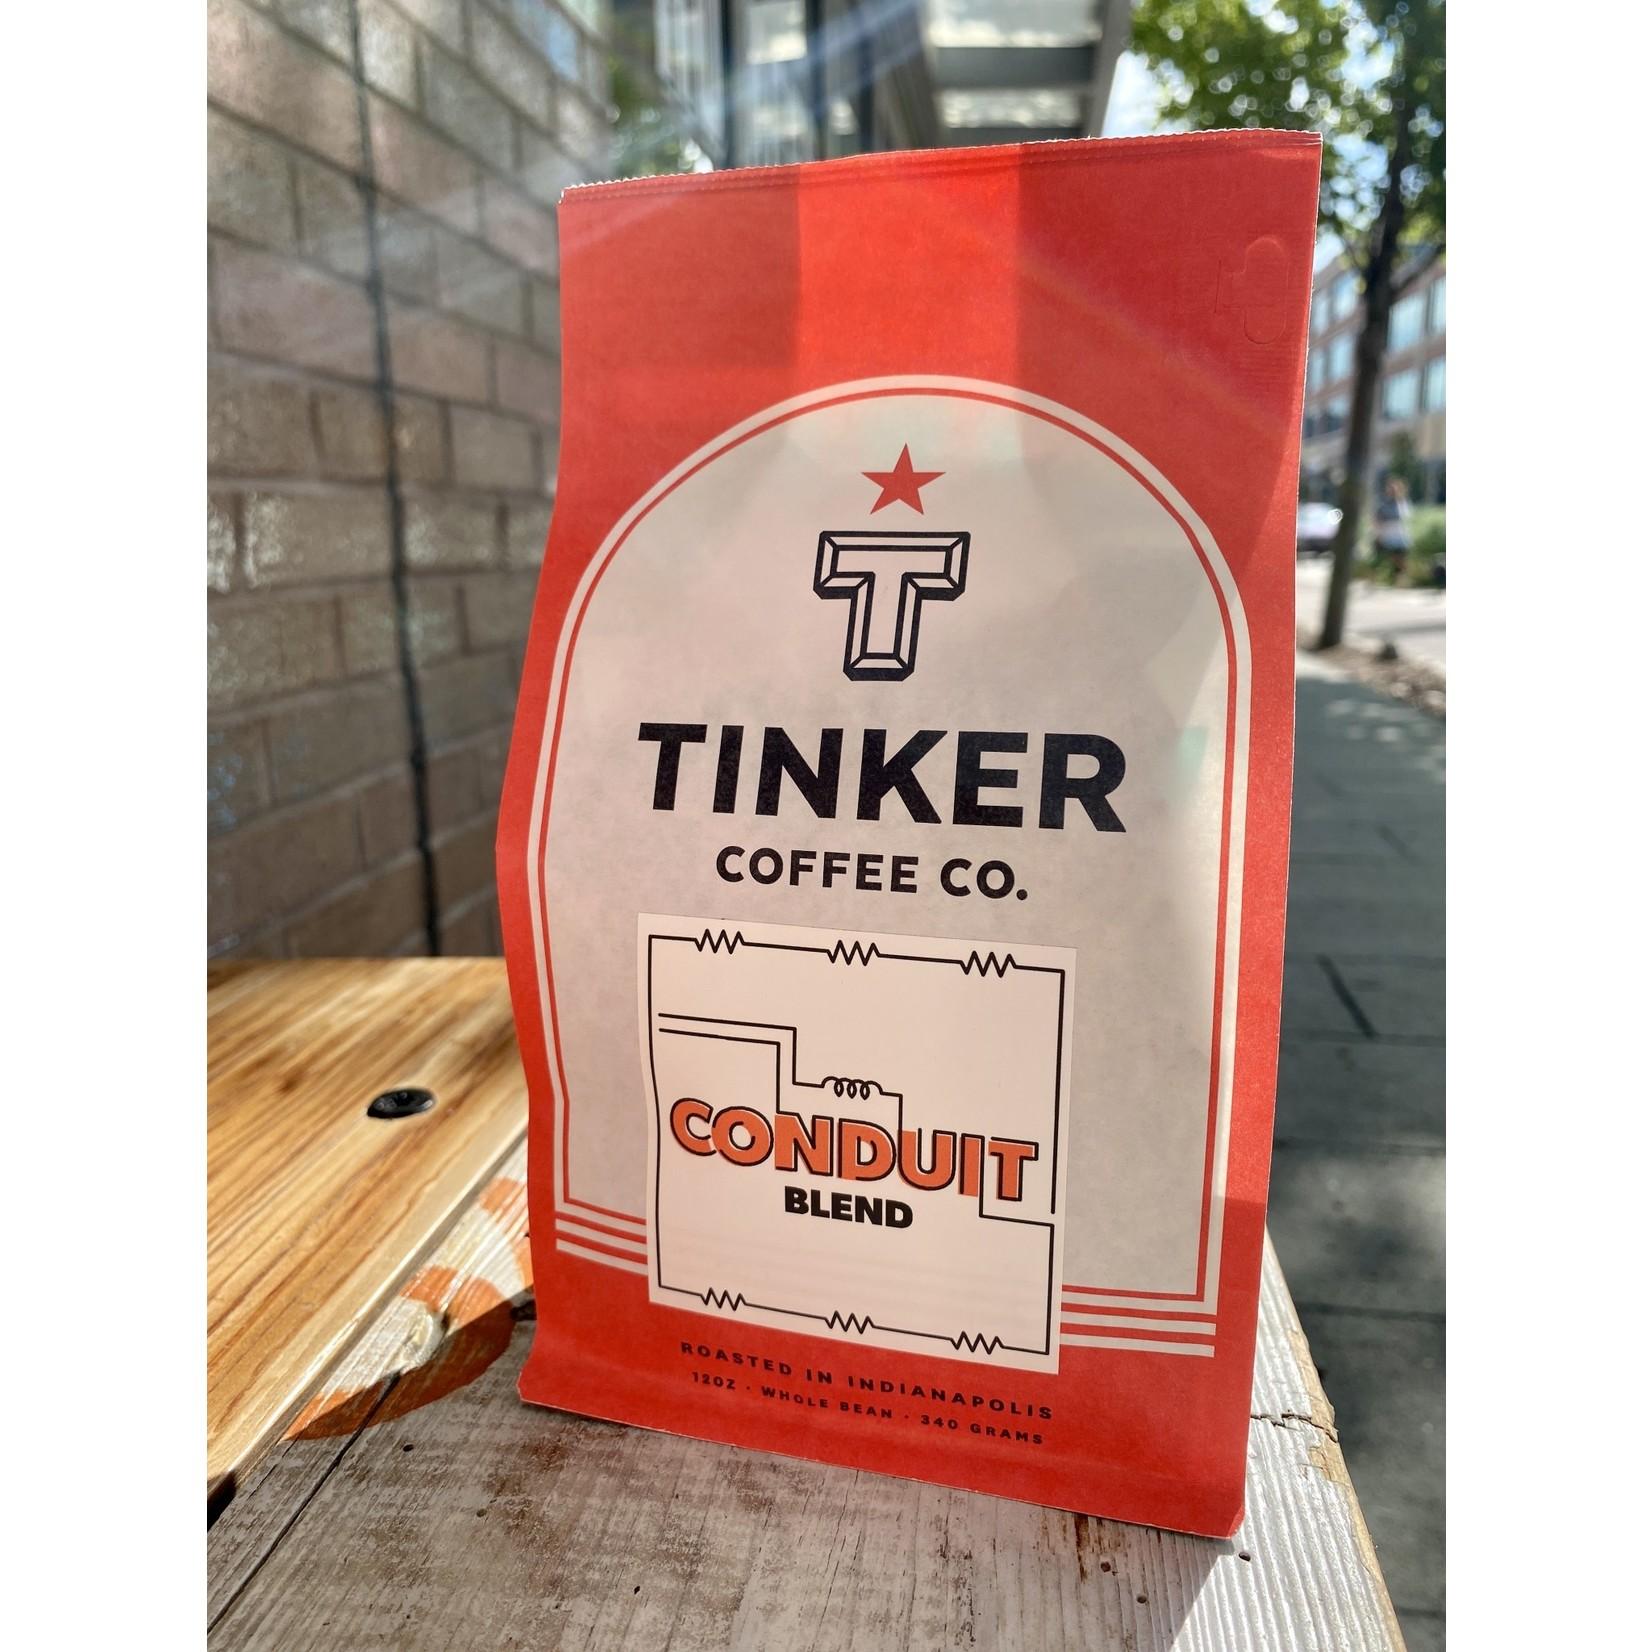 Tinker Coffee Co. Tinker Whole Bean Coffee 12oz. Bags